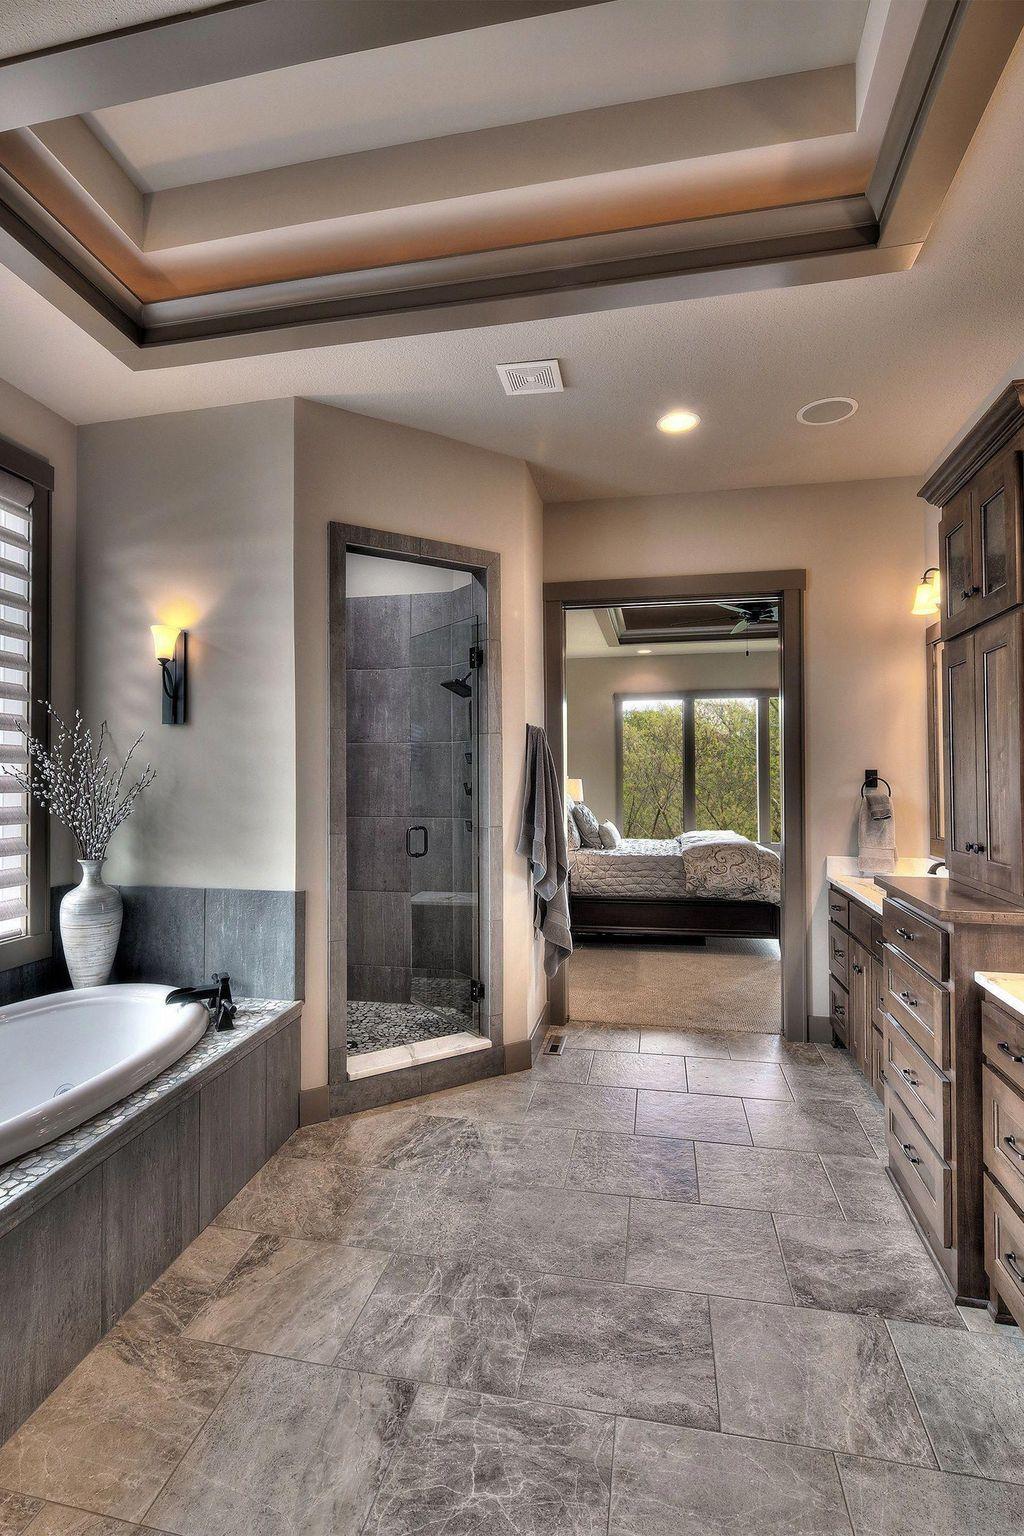 36 Amazing Bathroom Tile Ideas To Beautify Your Bathroom